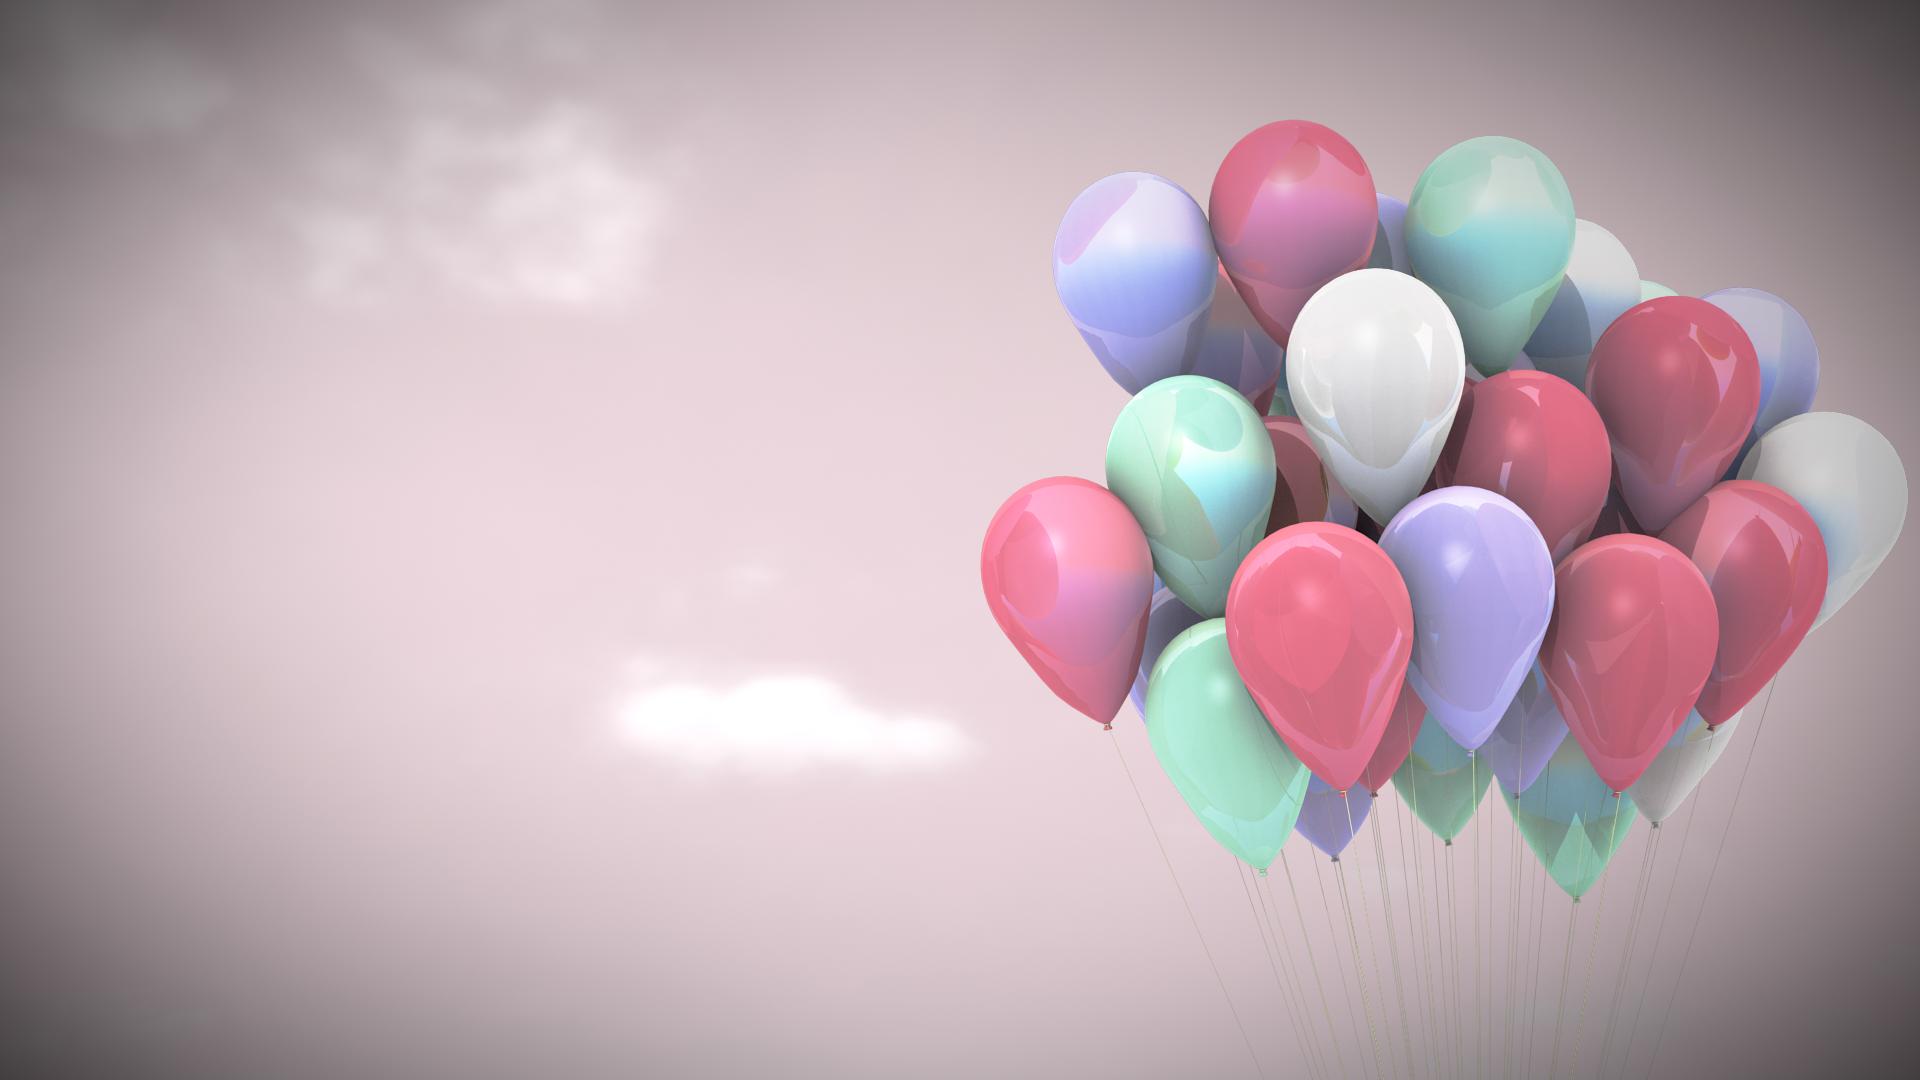 how to make a sky balloon